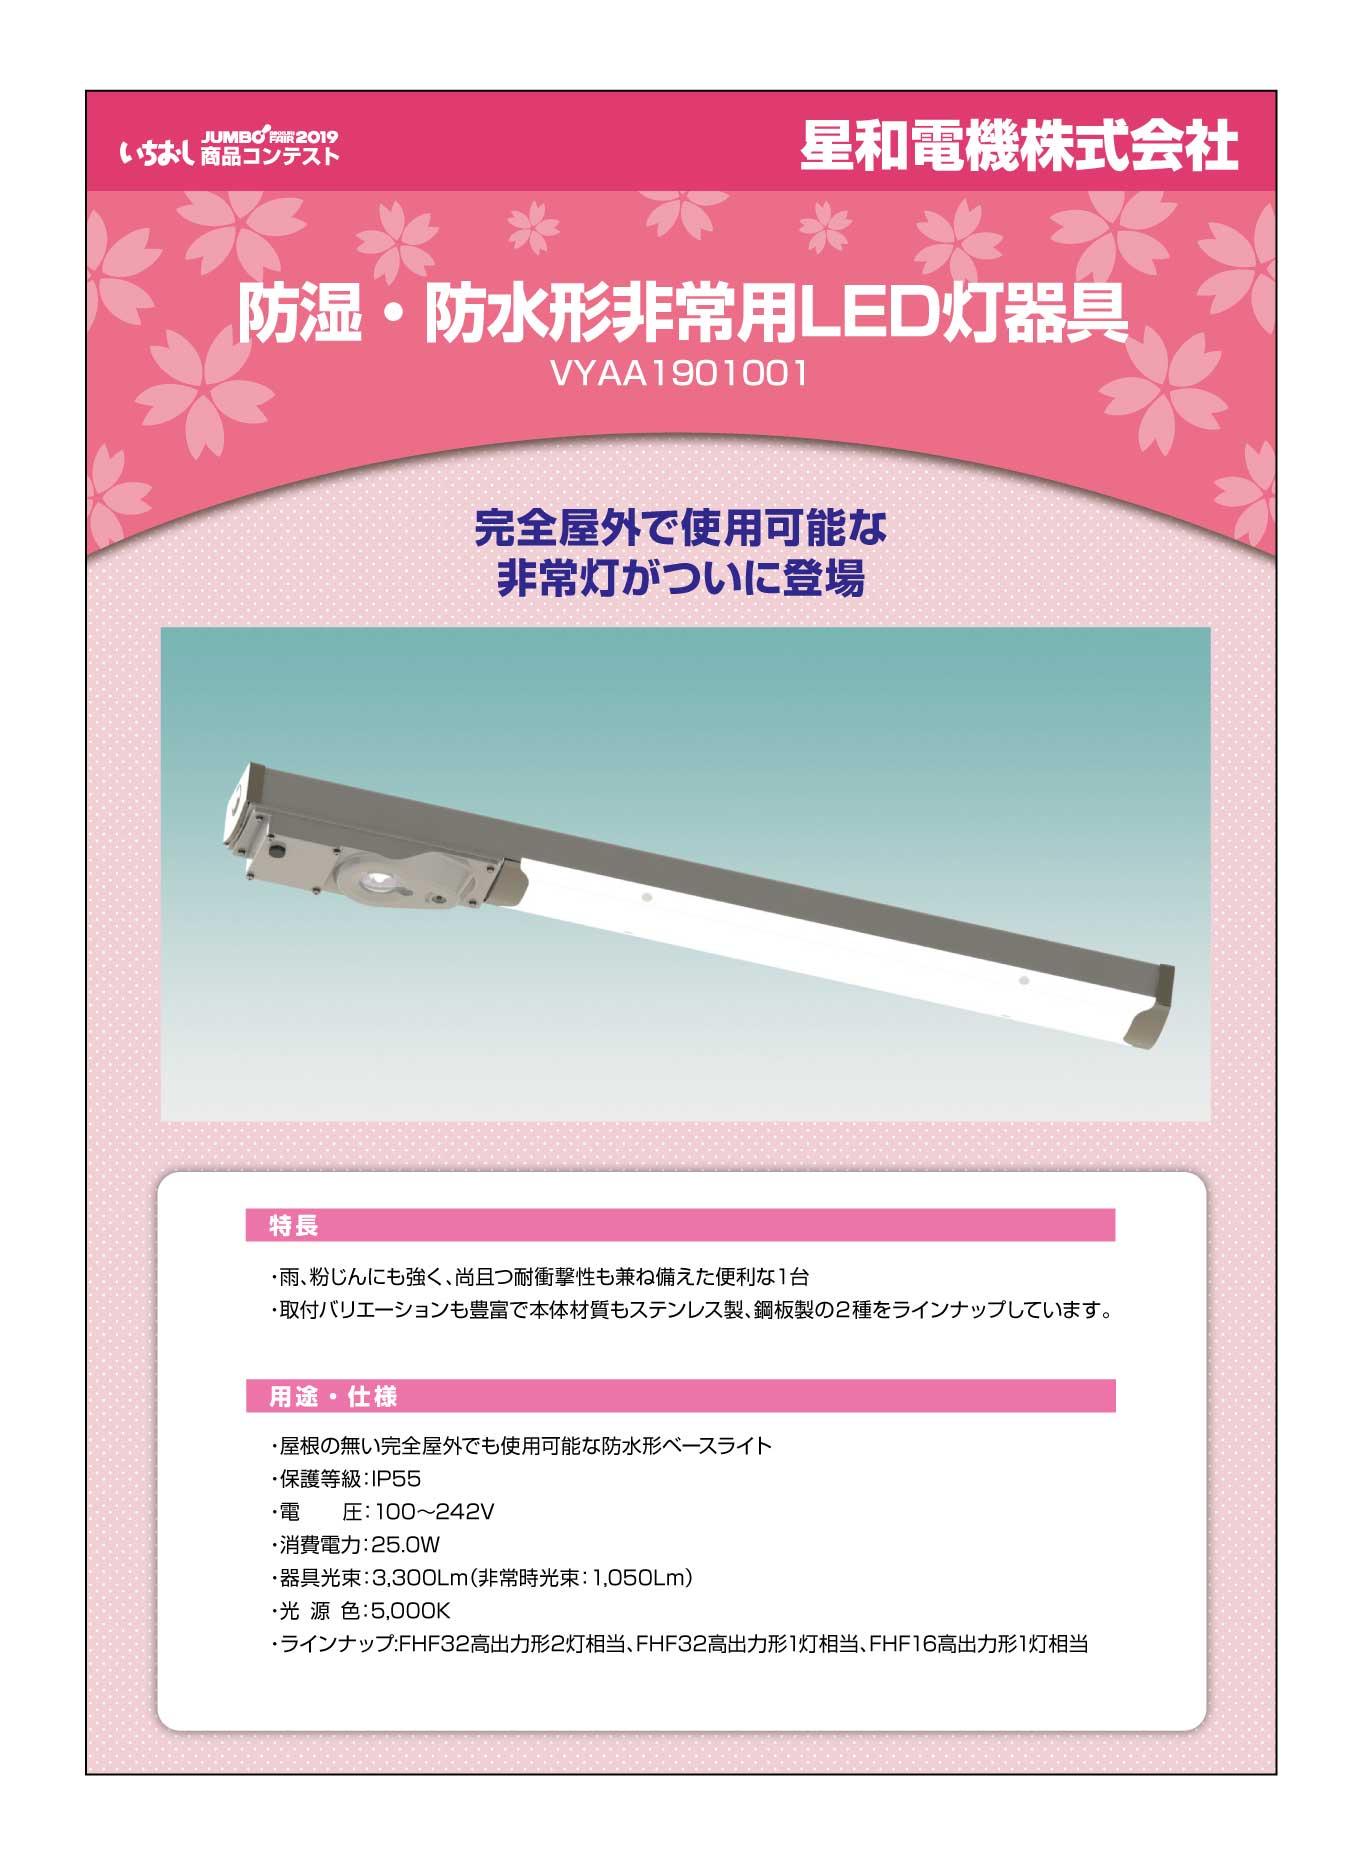 「防湿・防水形非常用LED灯器具」星和電機株式会社の画像